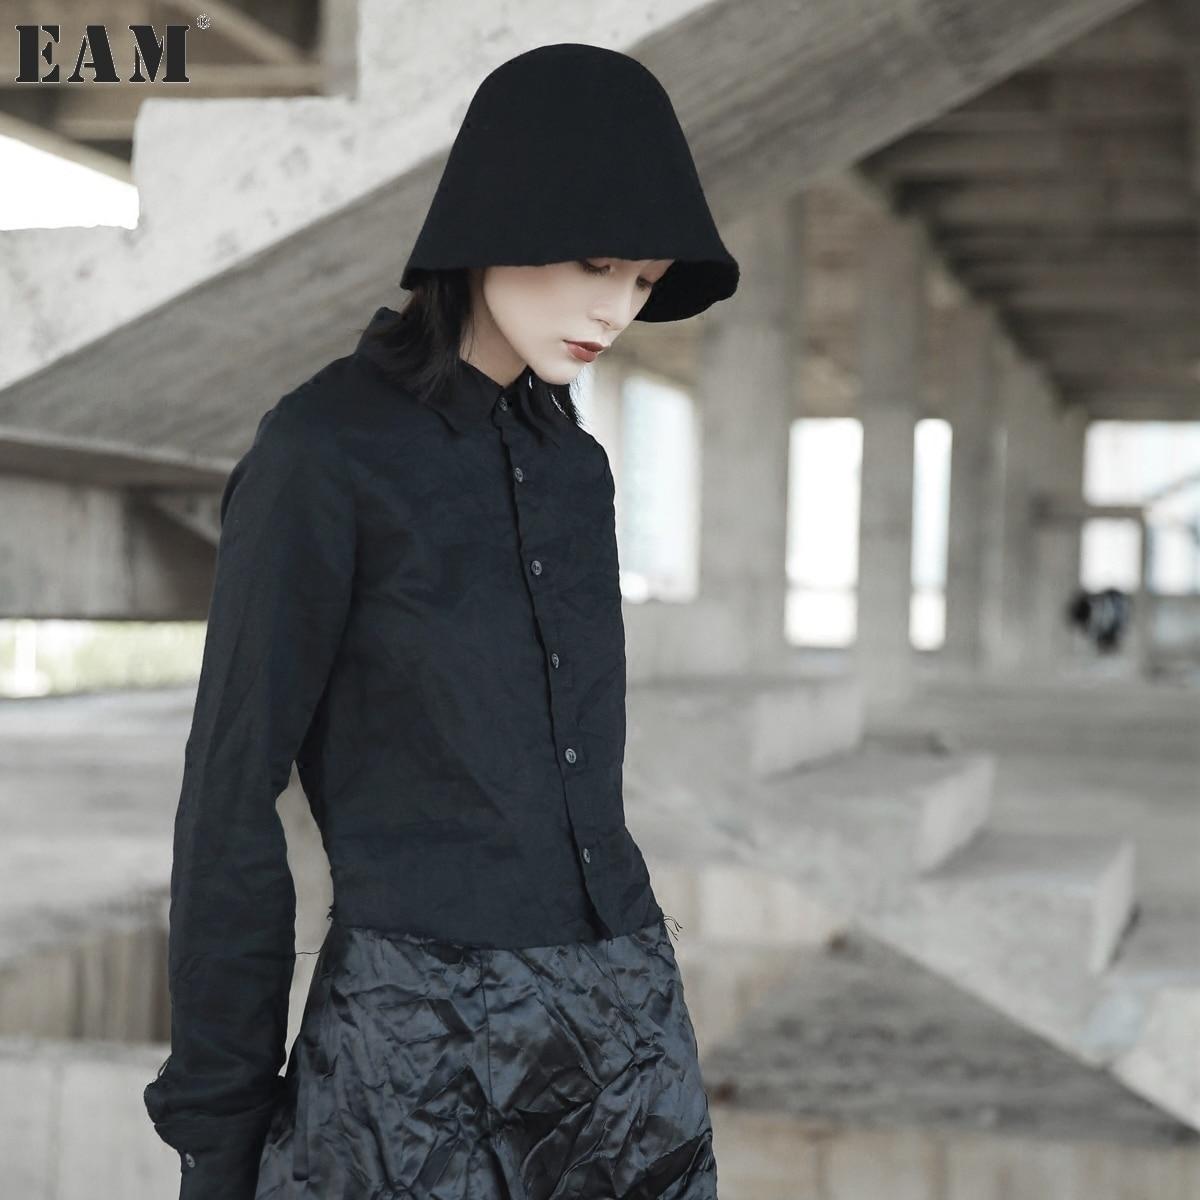 [EAM] 2018 New Spring Fashion Cut Side Cotton Linen Short Type Long Sleeve Solid Color Black Shirt Women YA12101S